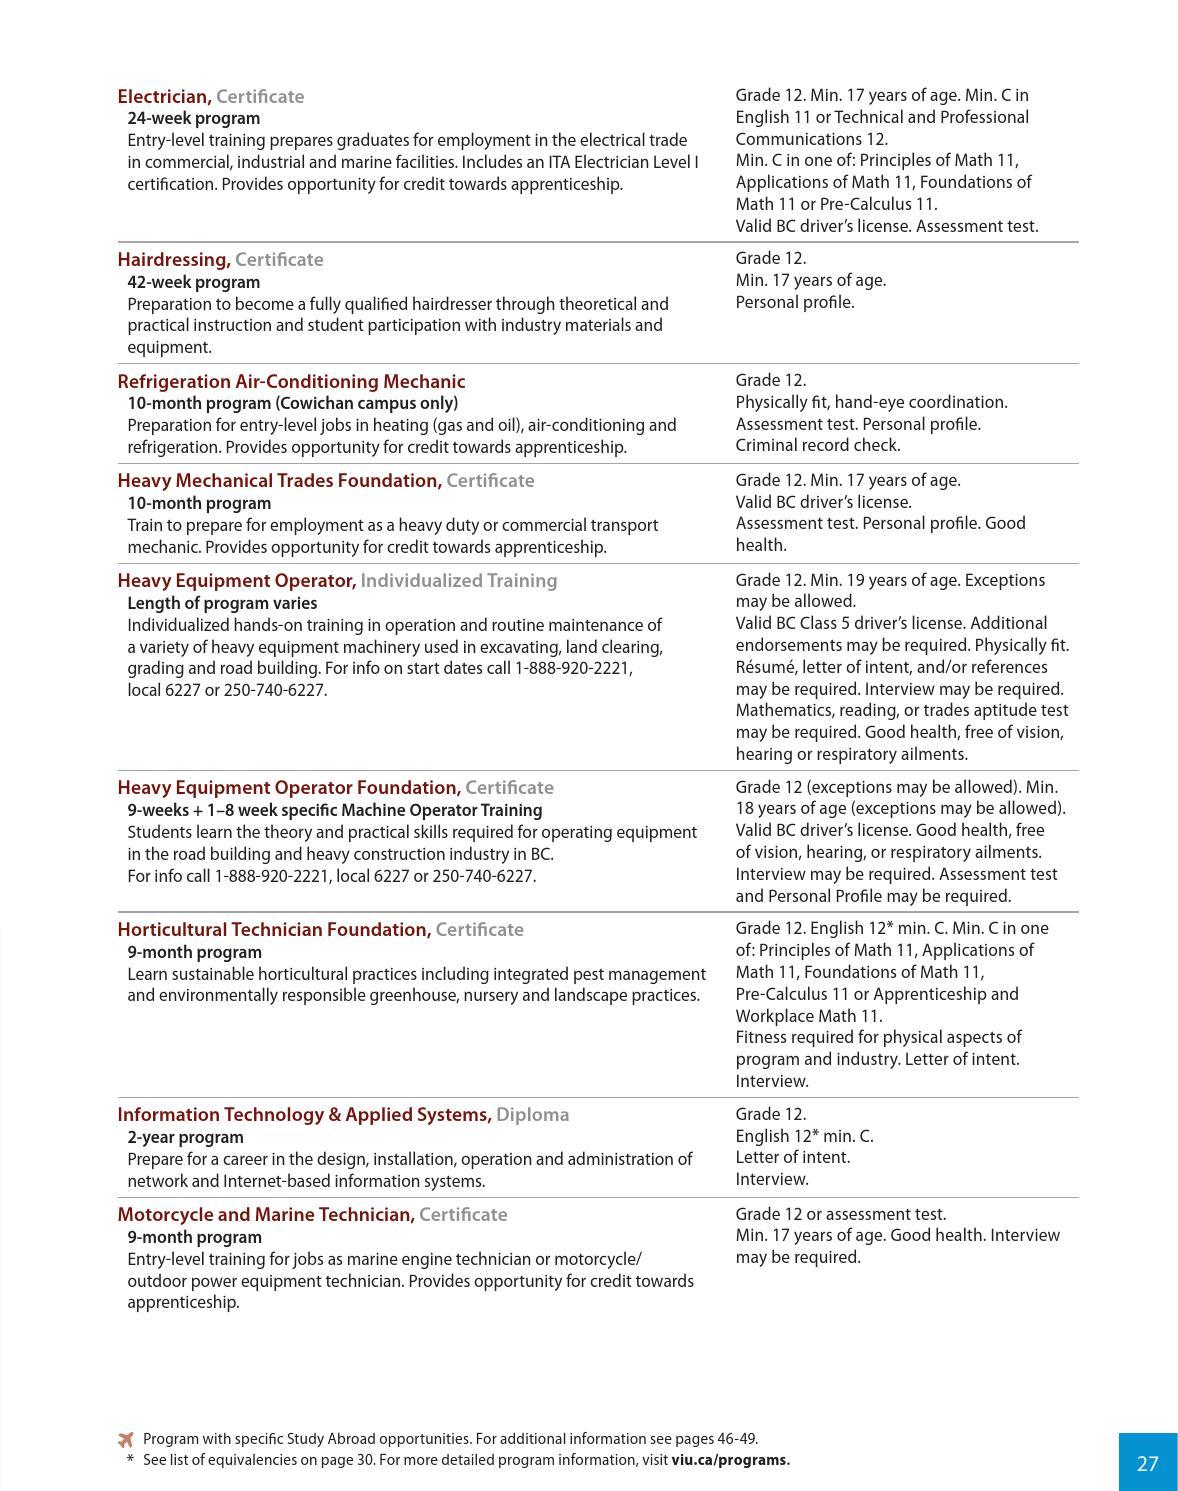 Viu Viewbook By Vancouver Island University Issuu